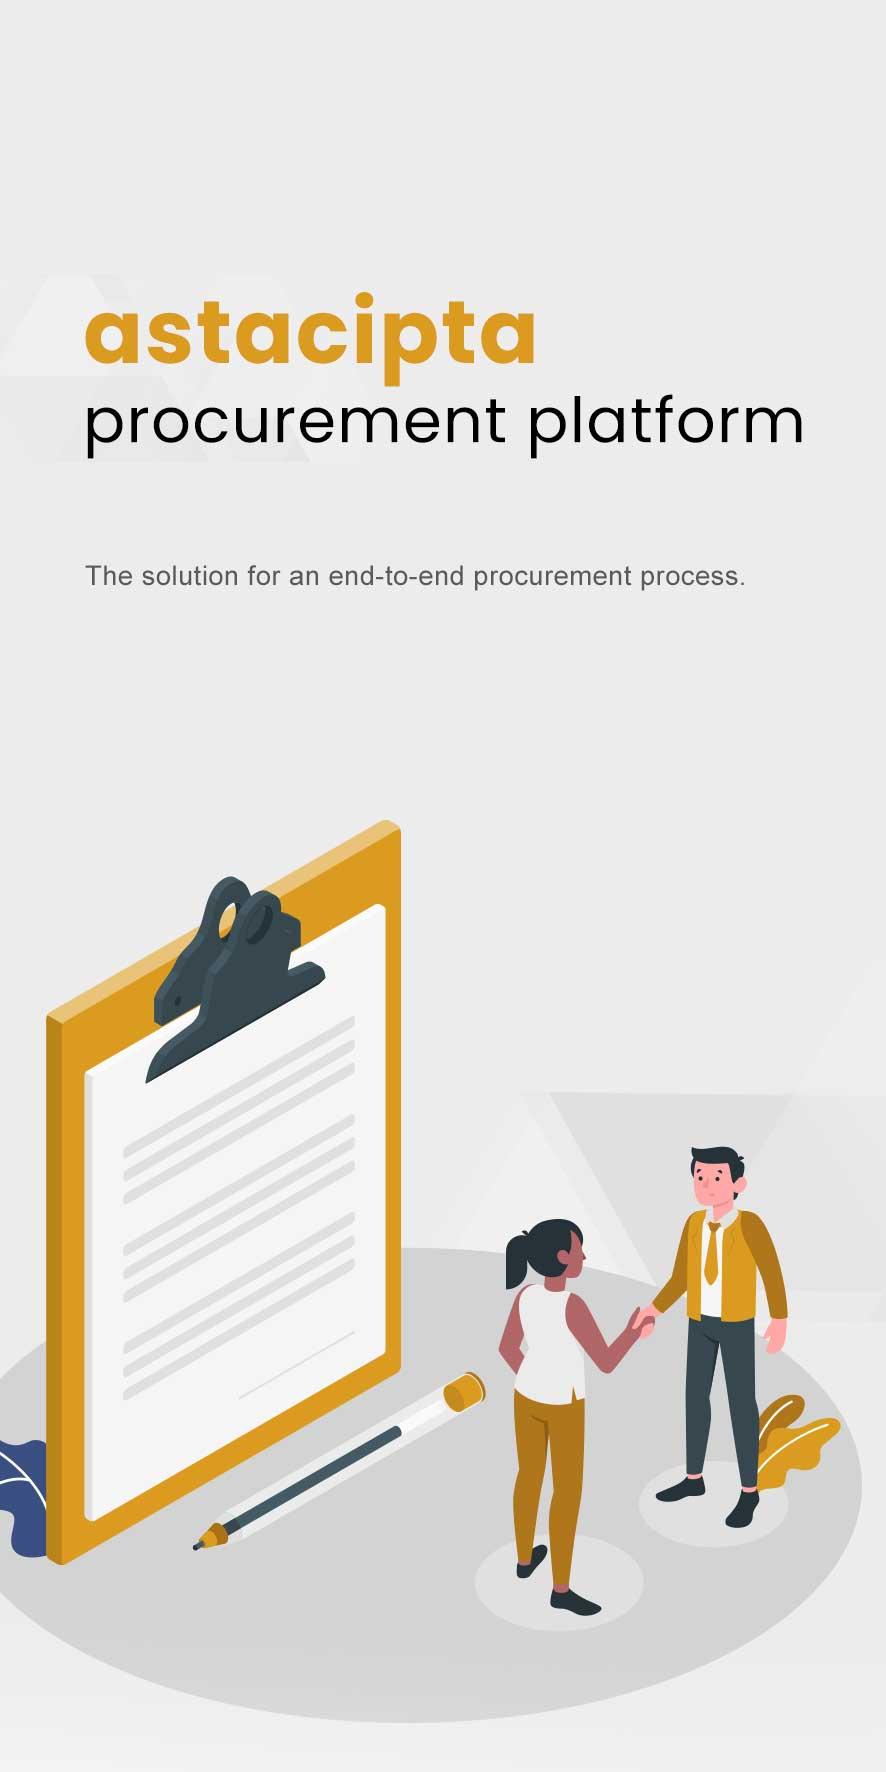 procurement platform asta